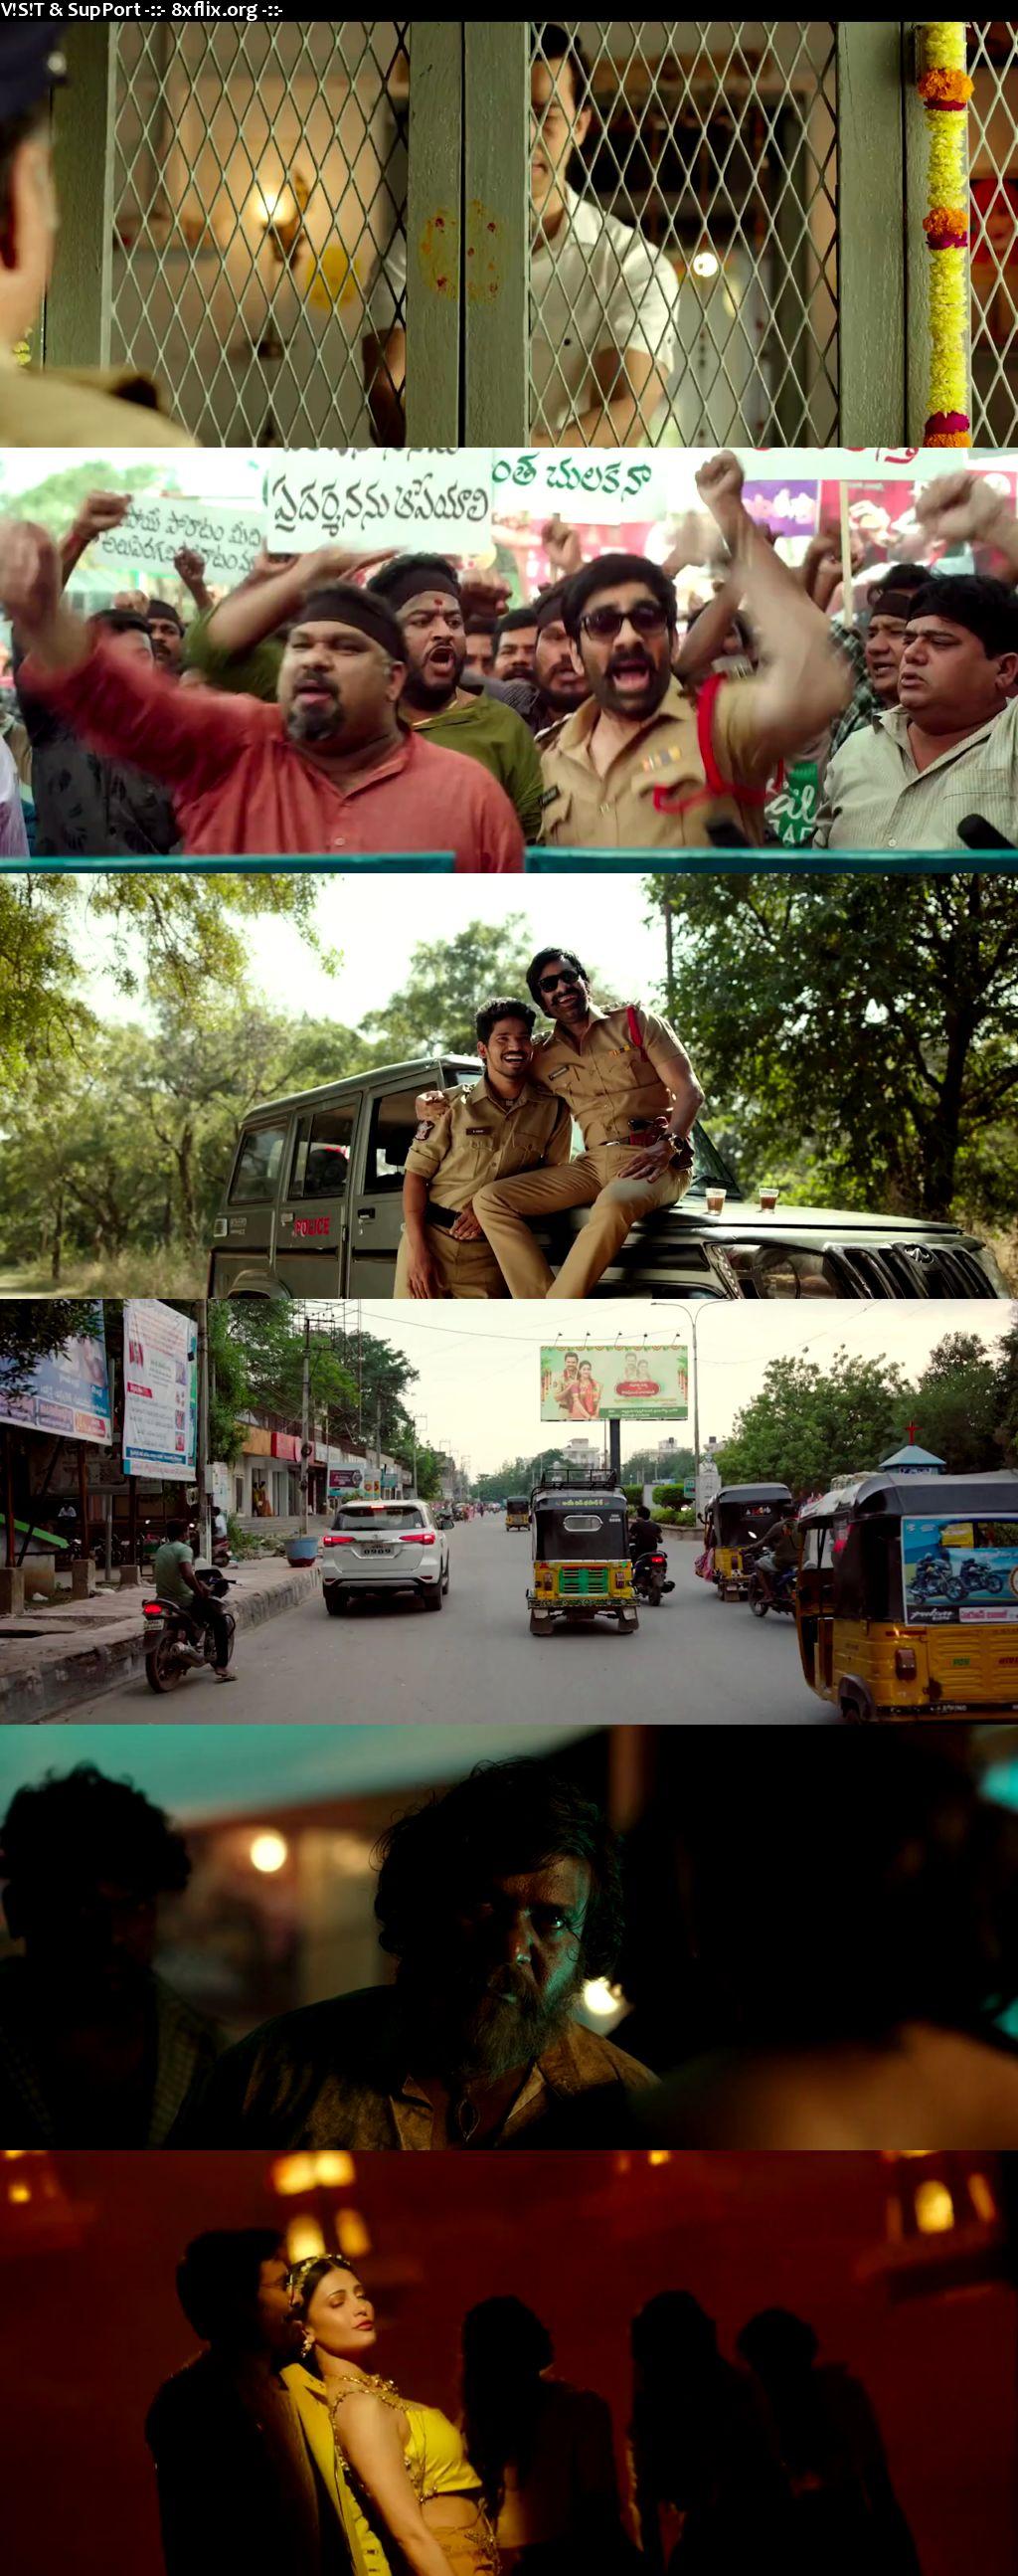 Krack 2021 Hindi Telugu Dual Audio 720p 480p UNCUT HDRip